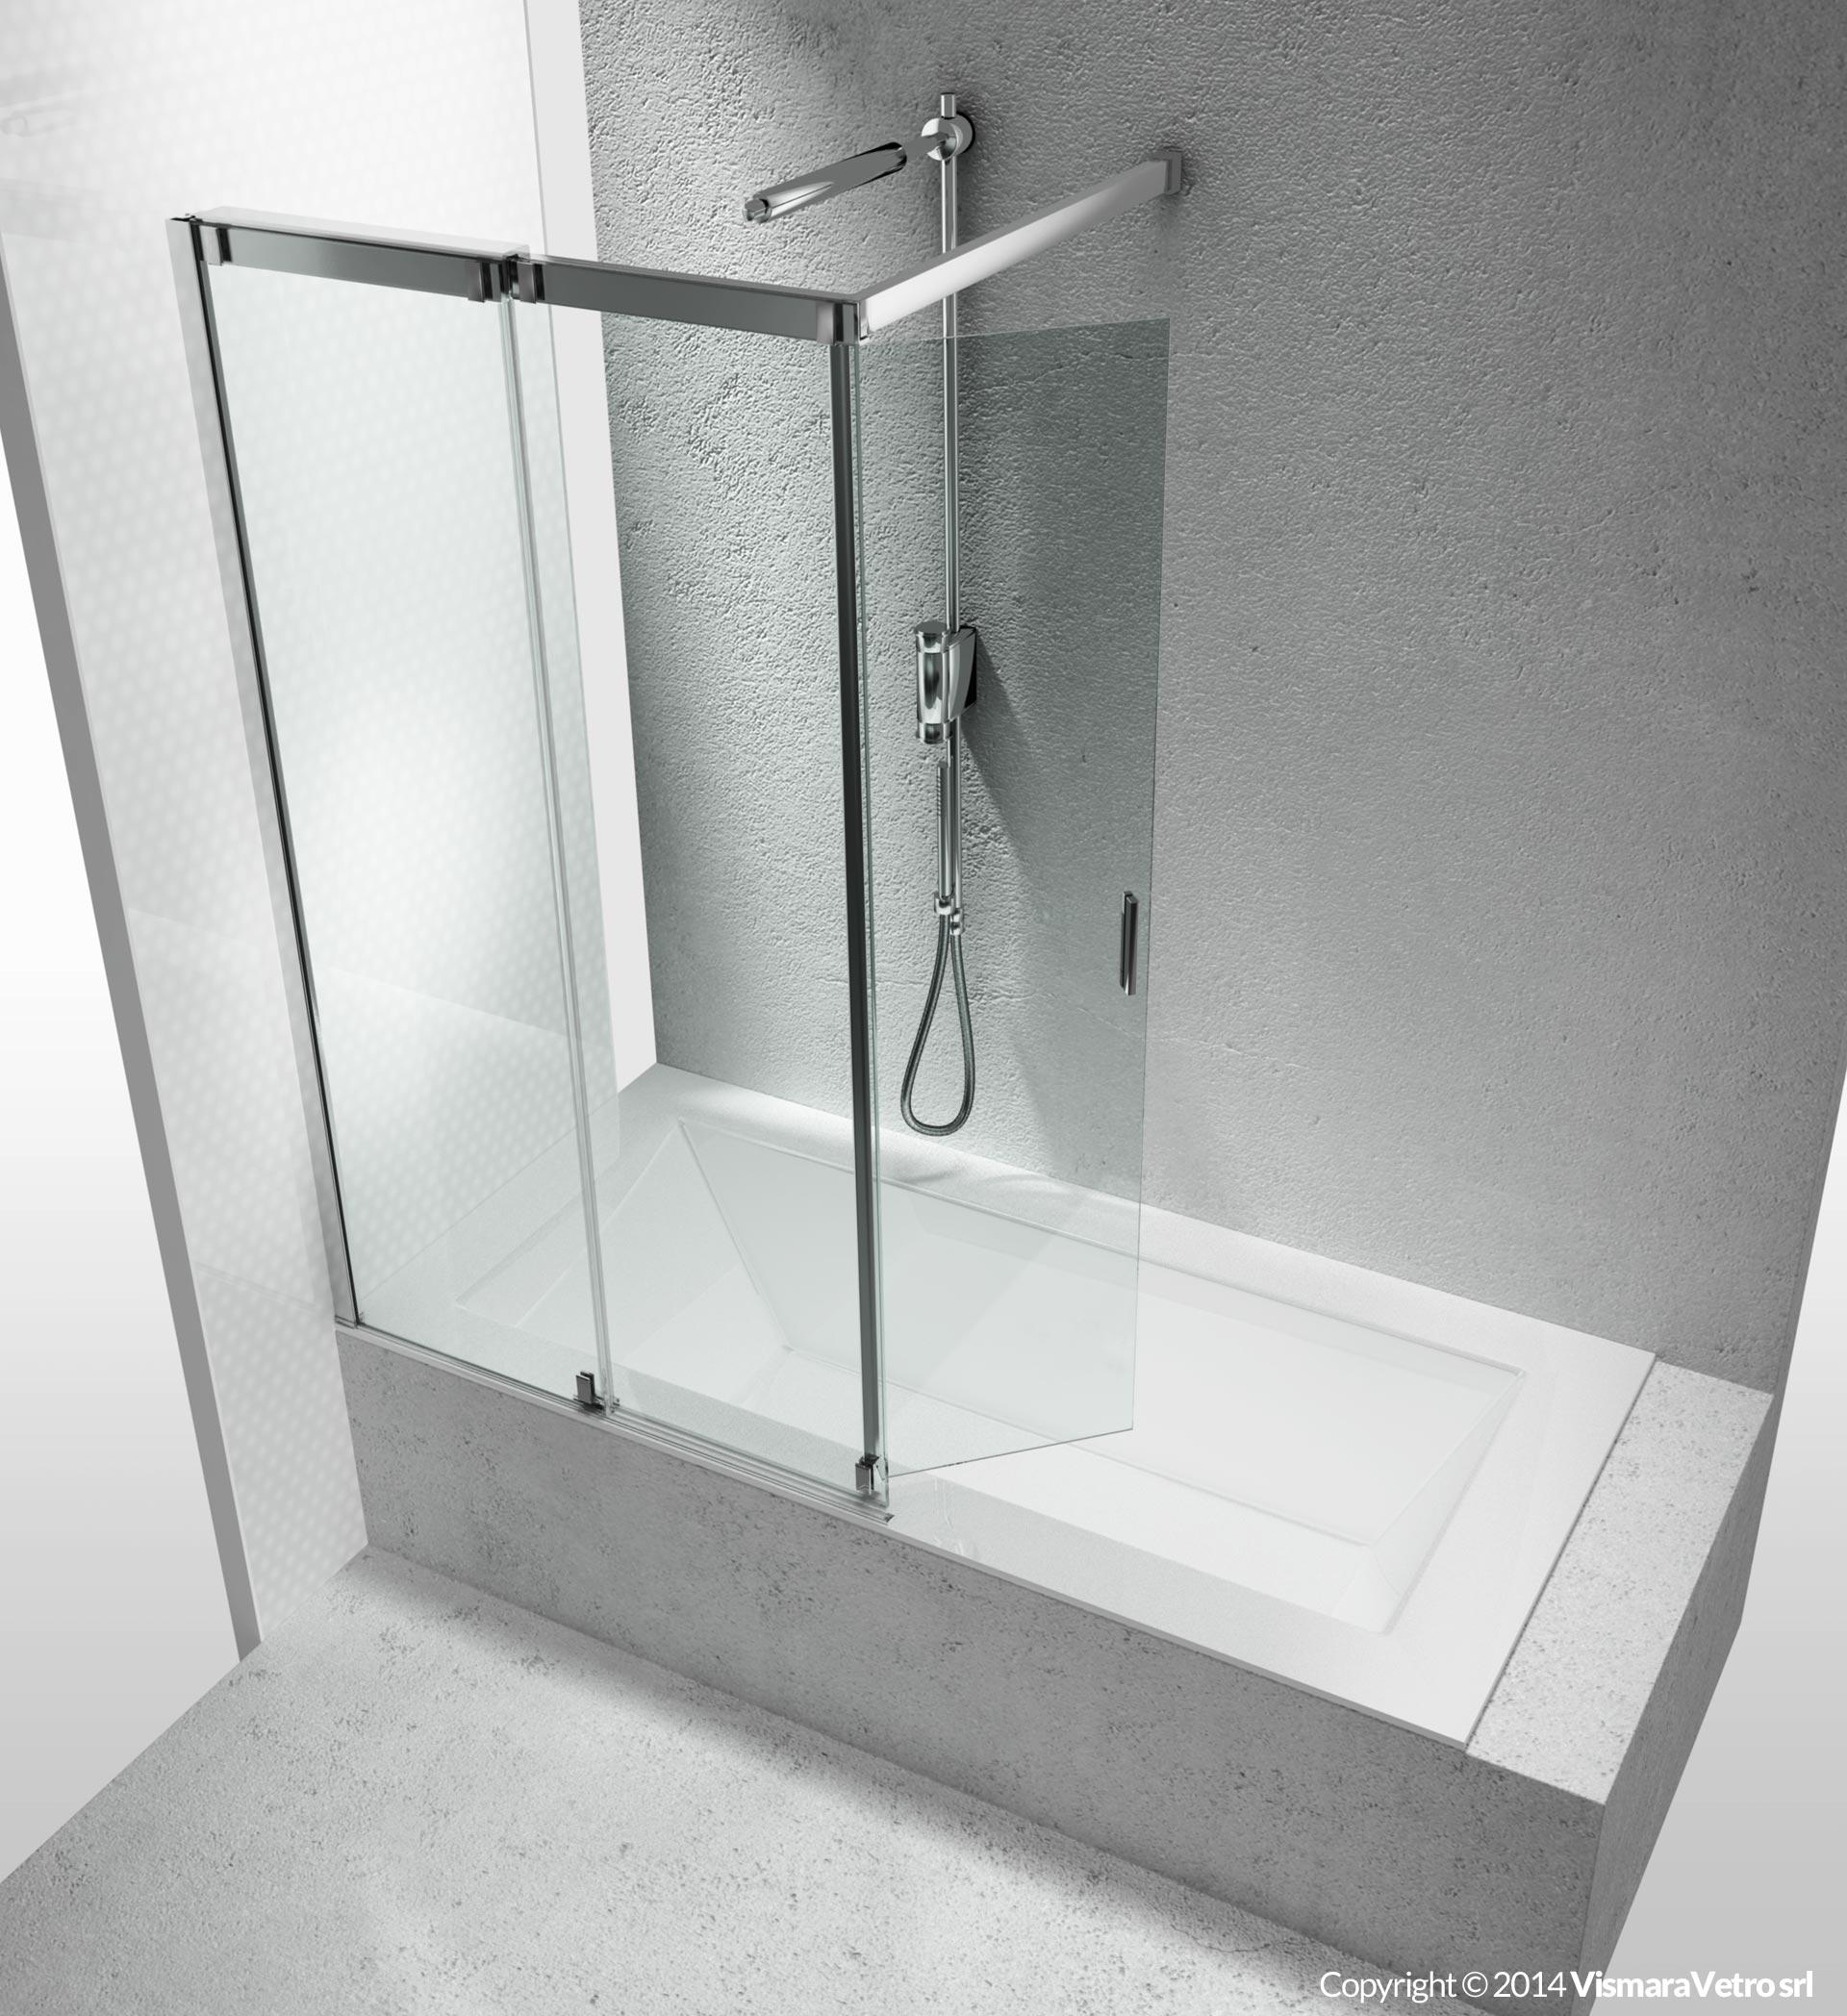 Vasche vr apertura scorrevole for Parete vasca pieghevole